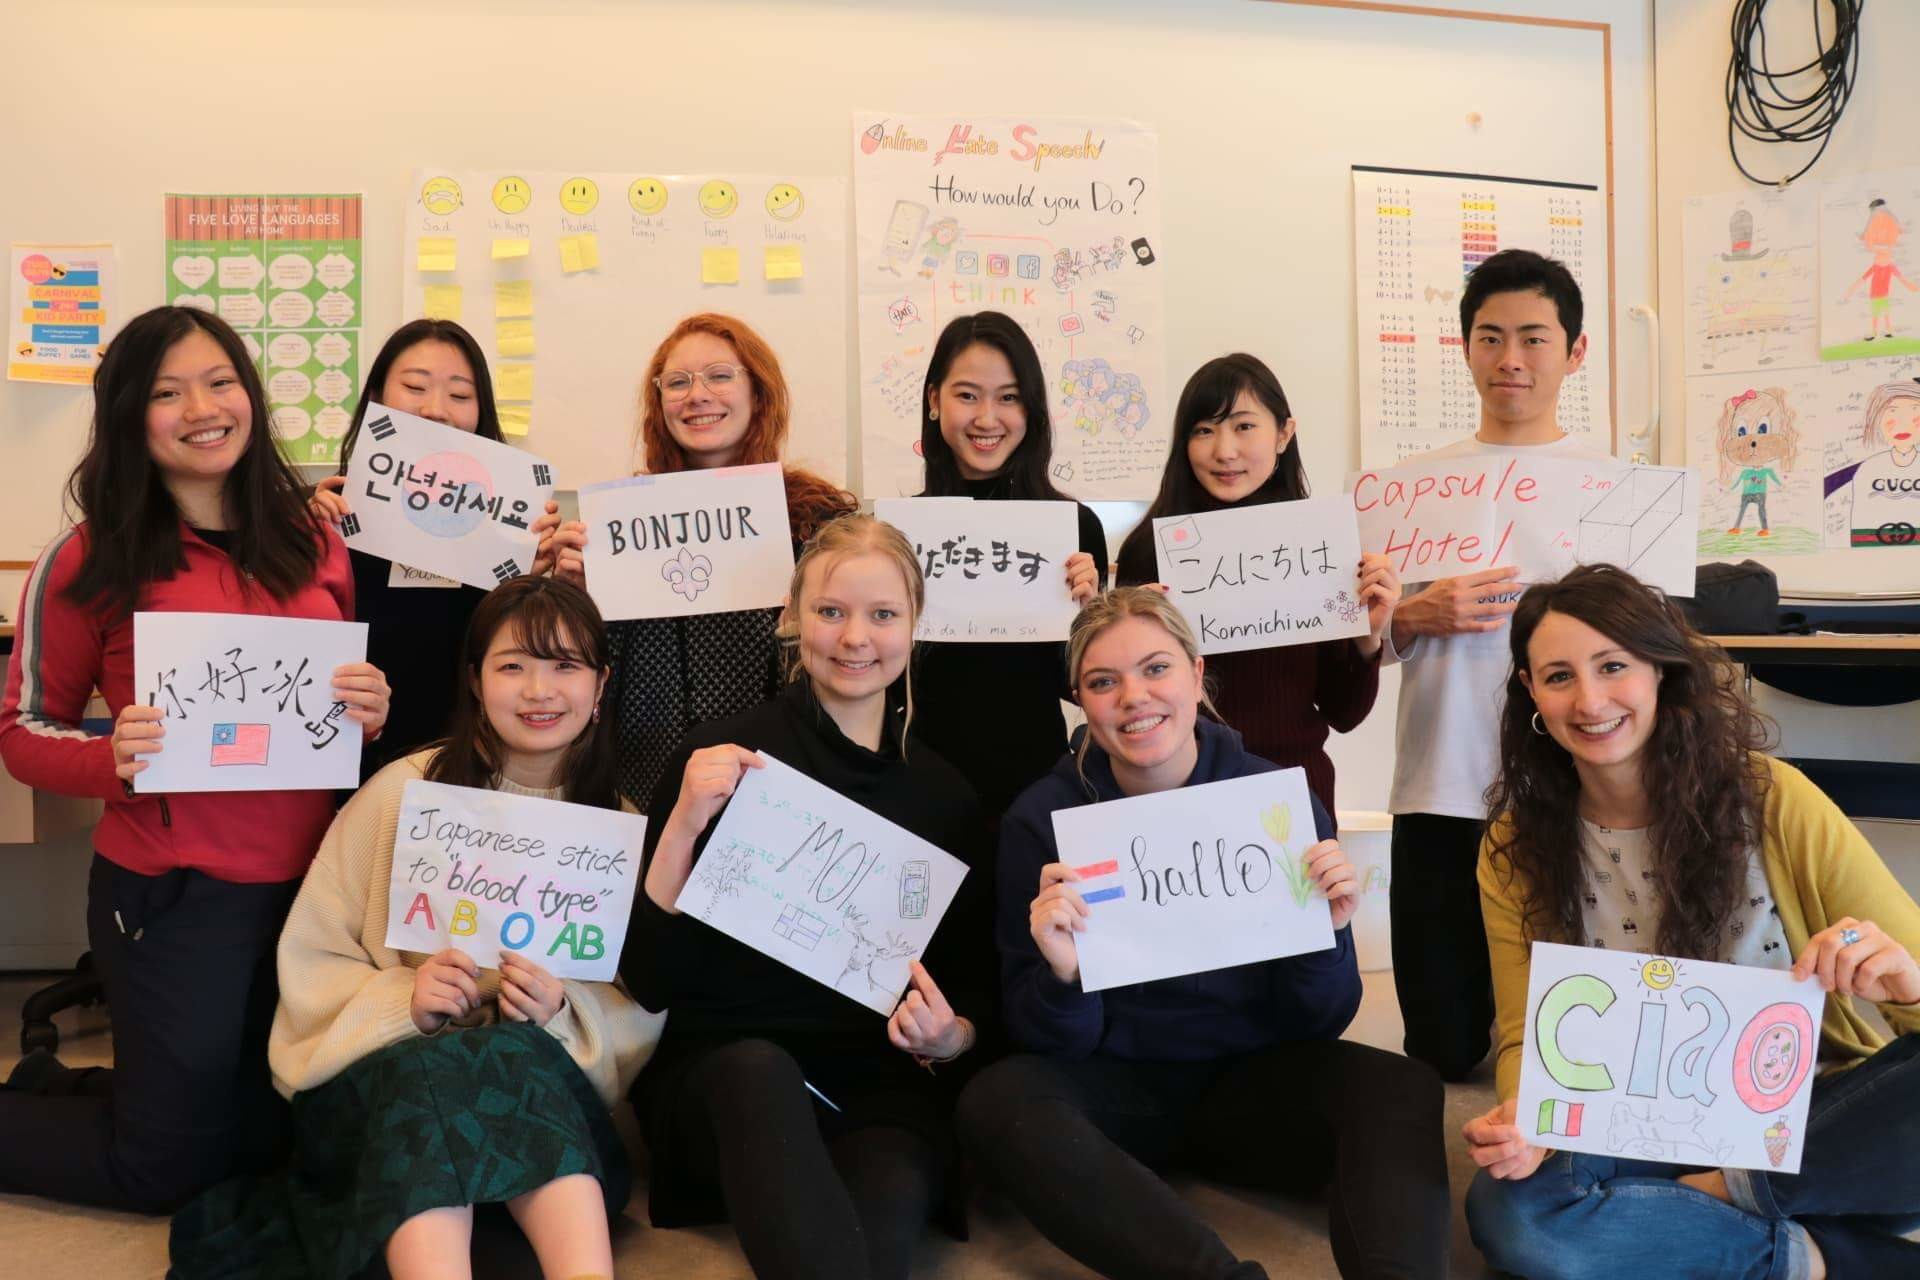 Voluntary work in Iceland (1 of 2): Volunteering in a school